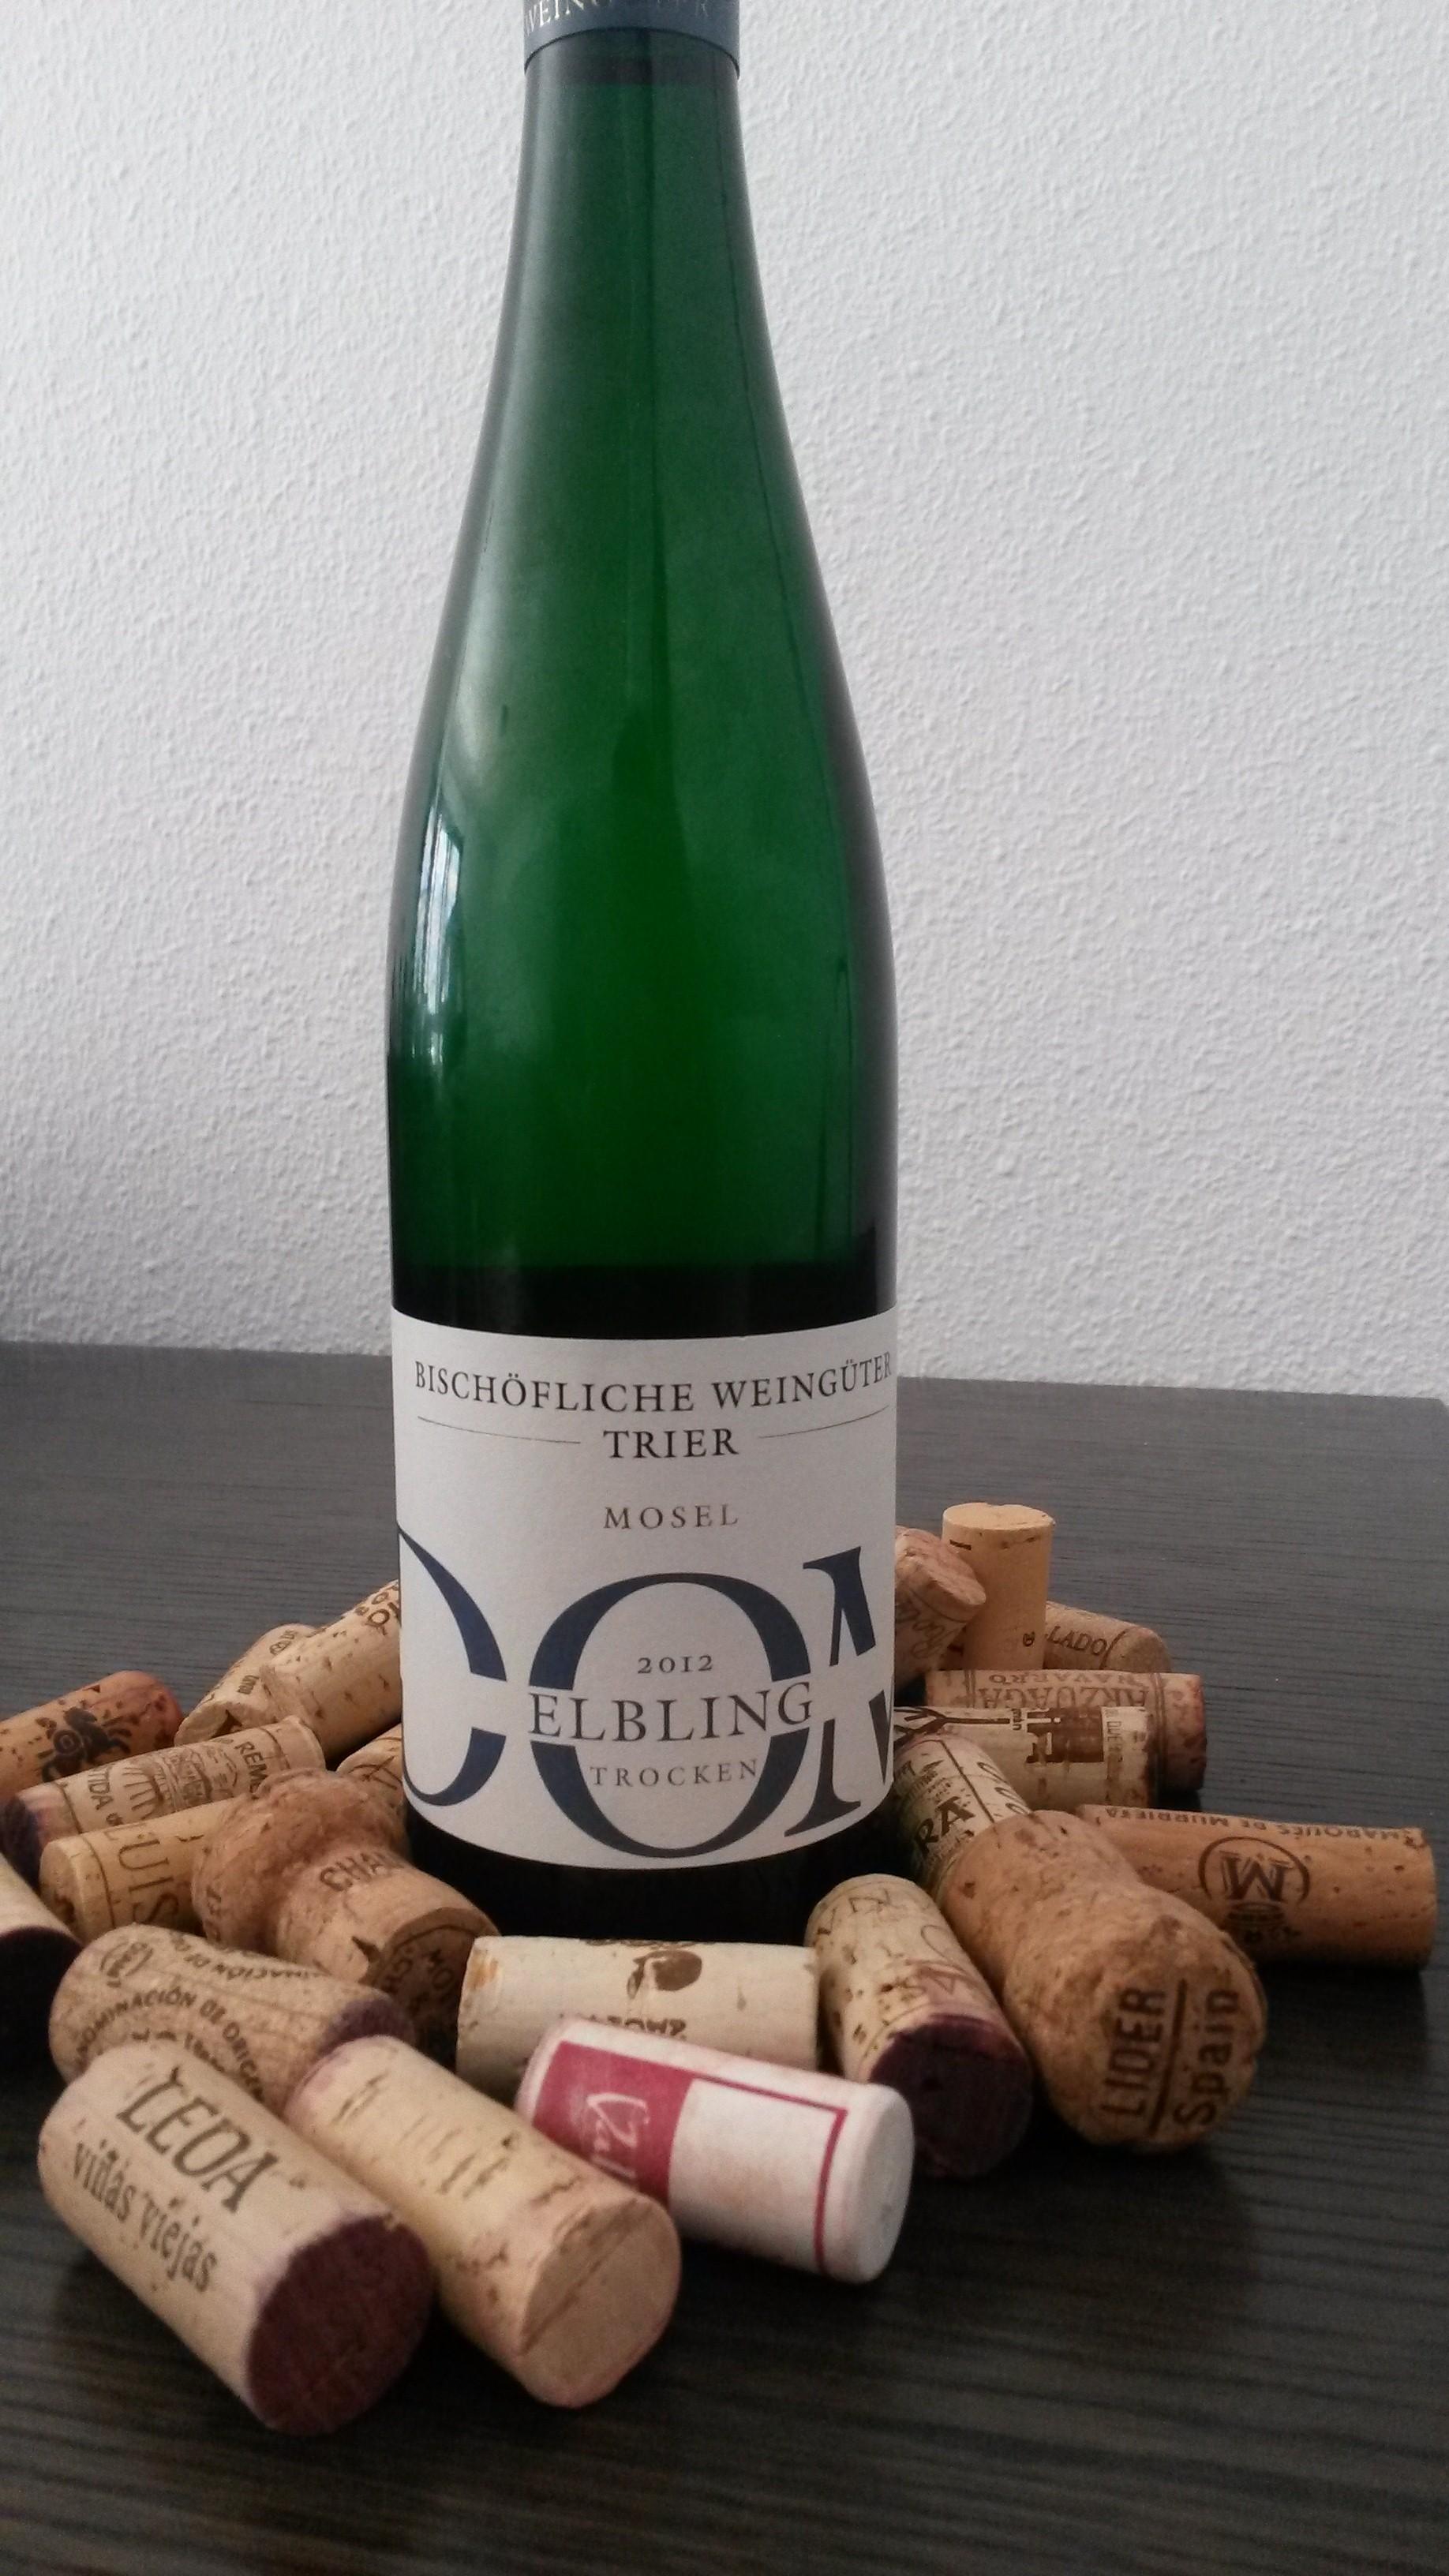 Weingut Trier Mosel Elbling